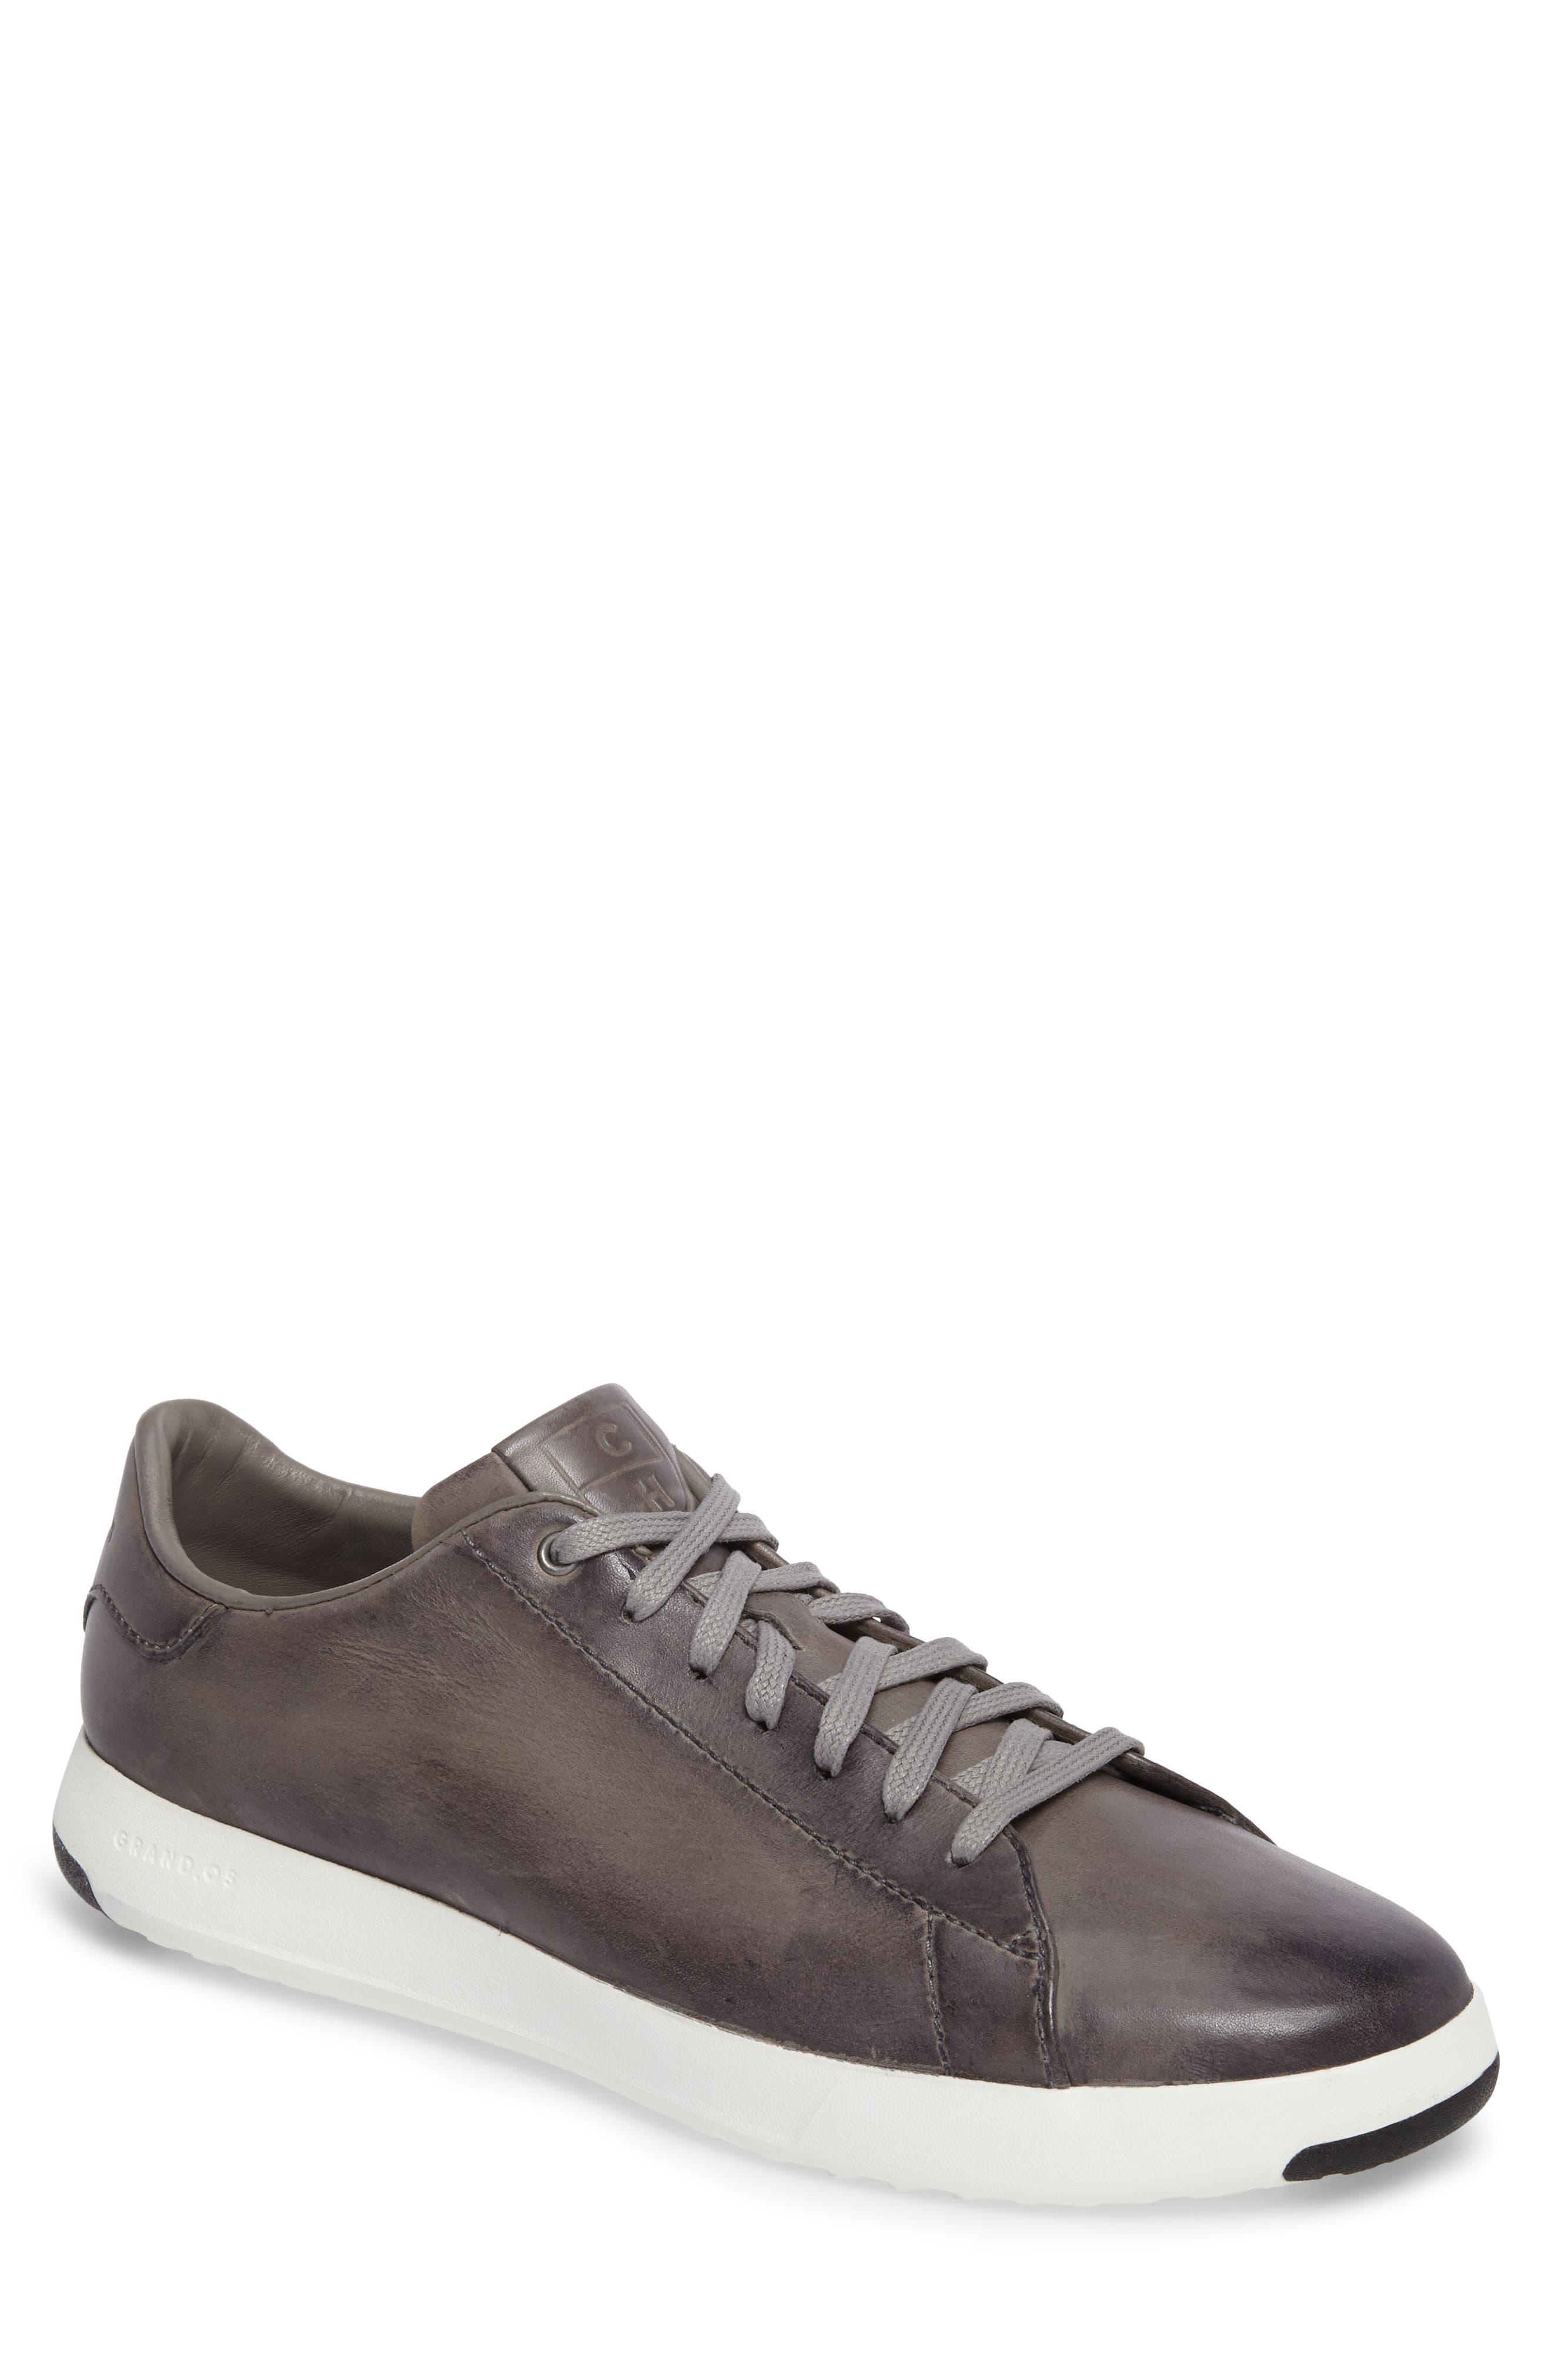 GrandPro Tennis Sneaker,                         Main,                         color, IRONSTONE GRAY HANDSTAIN